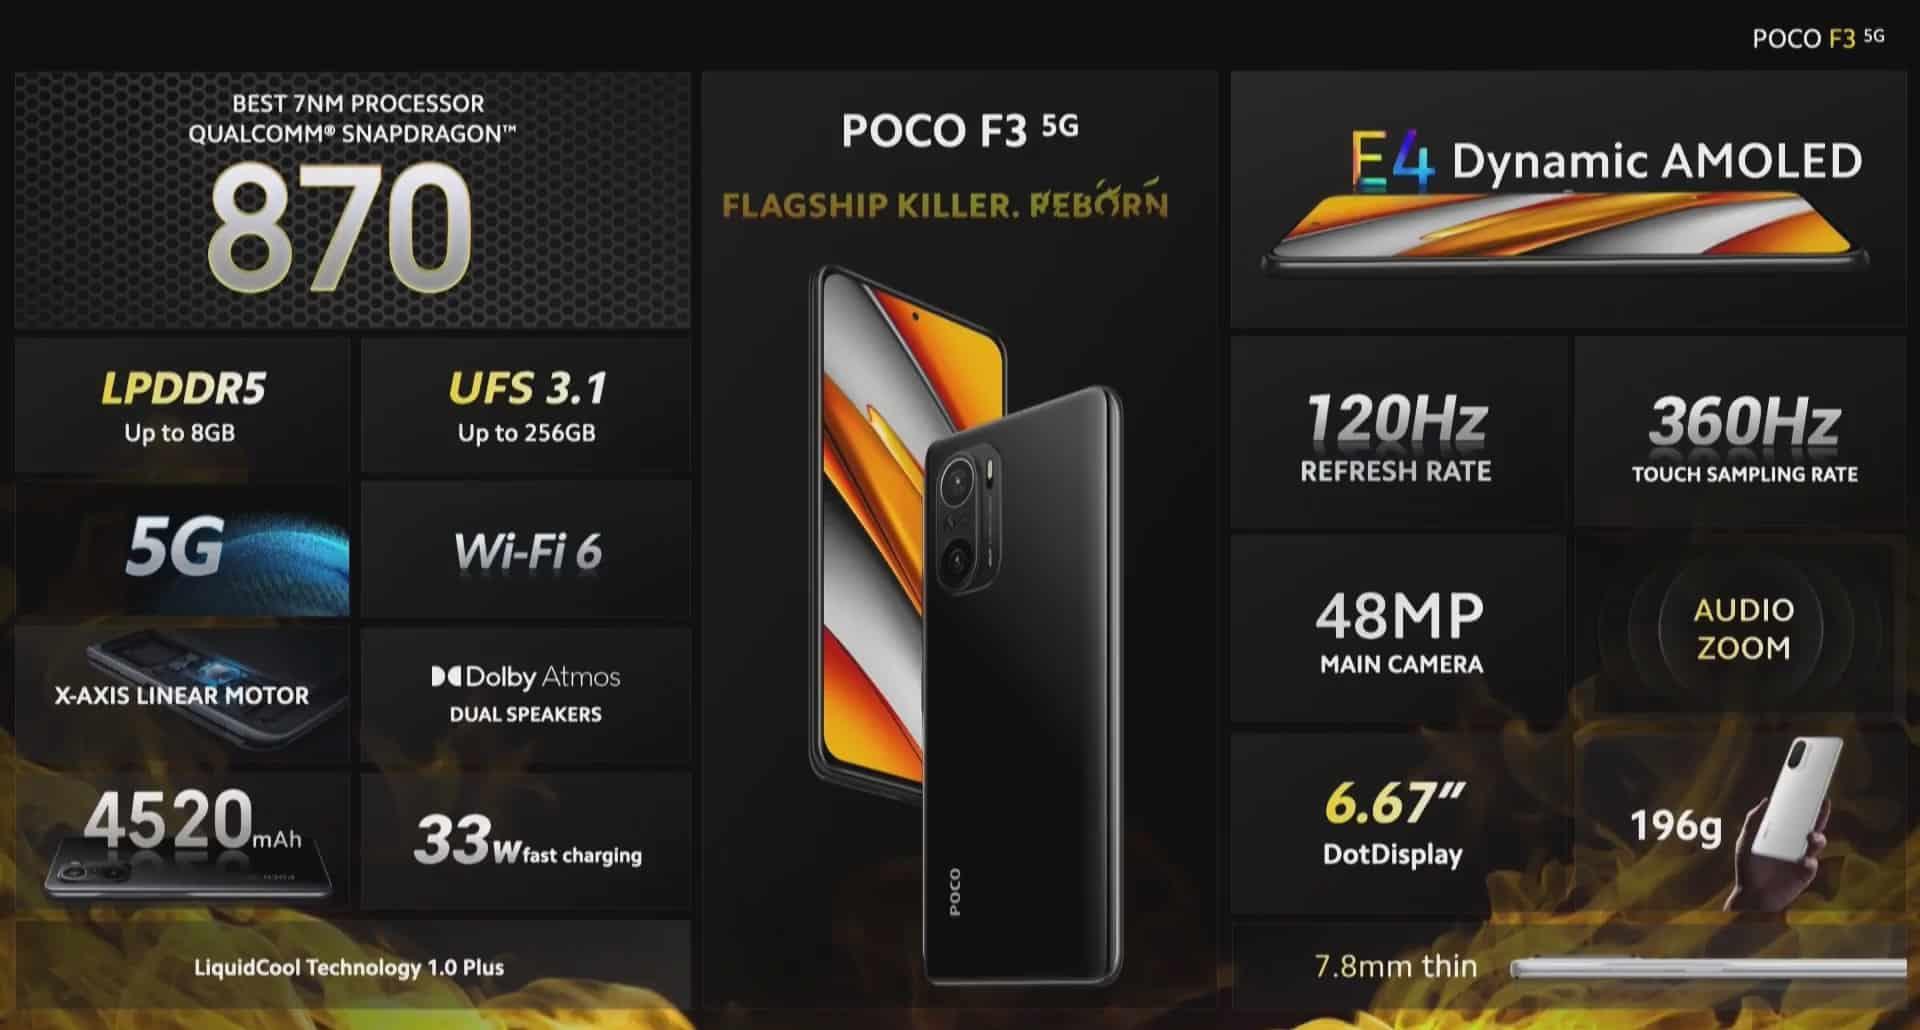 Spesifikasi POCO F3 5G